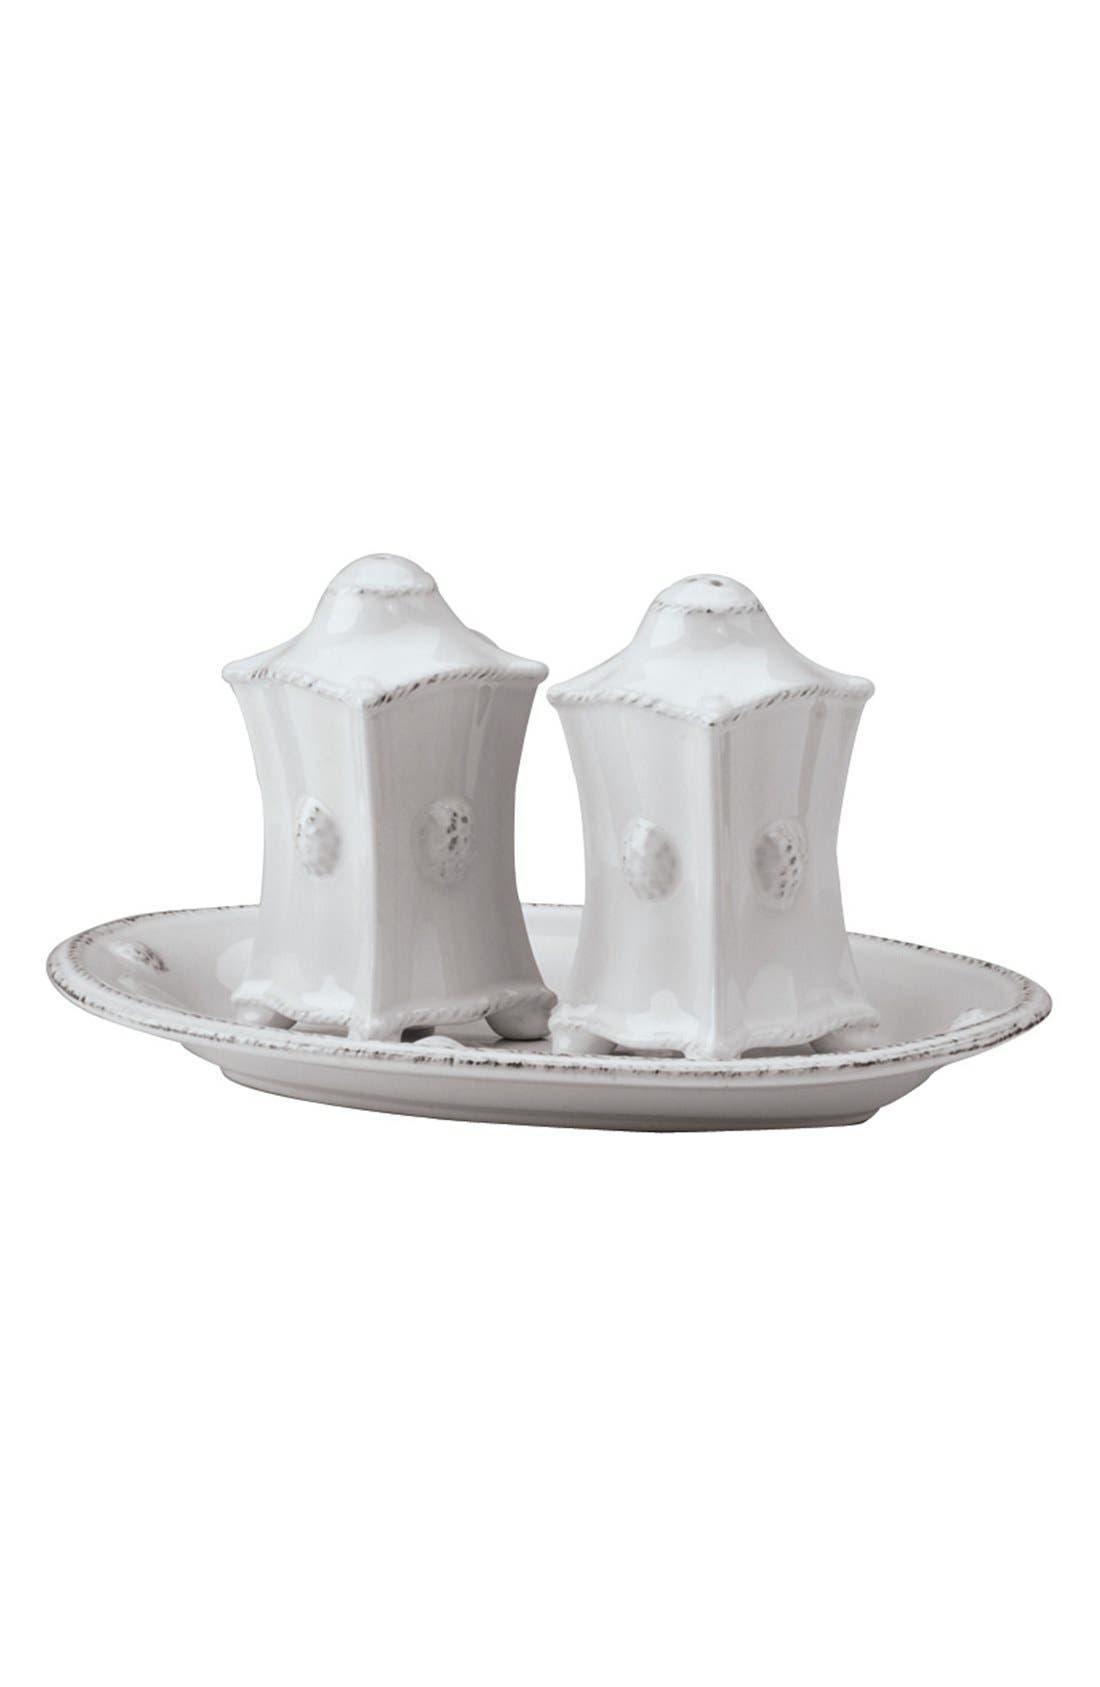 Main Image - Juliska'Berry and Thread' CeramicSalt & Pepper Shakers